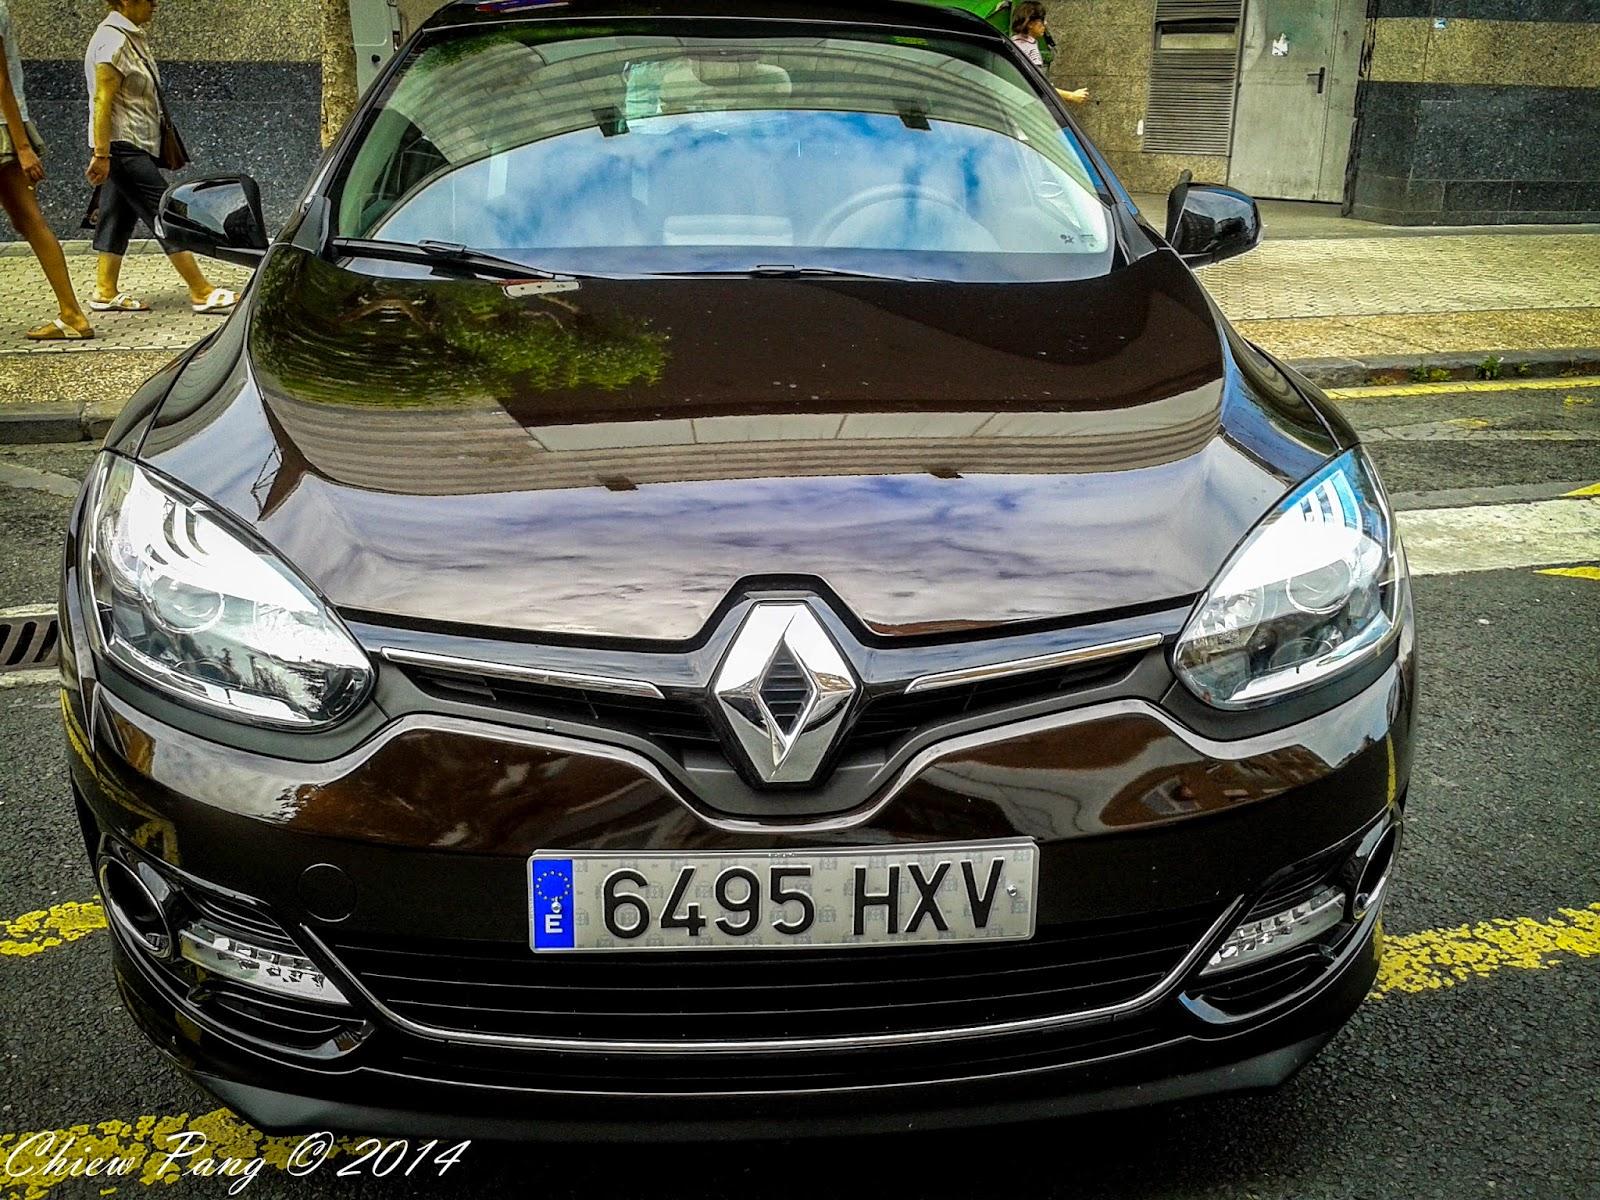 Renault Megane, start-stop model